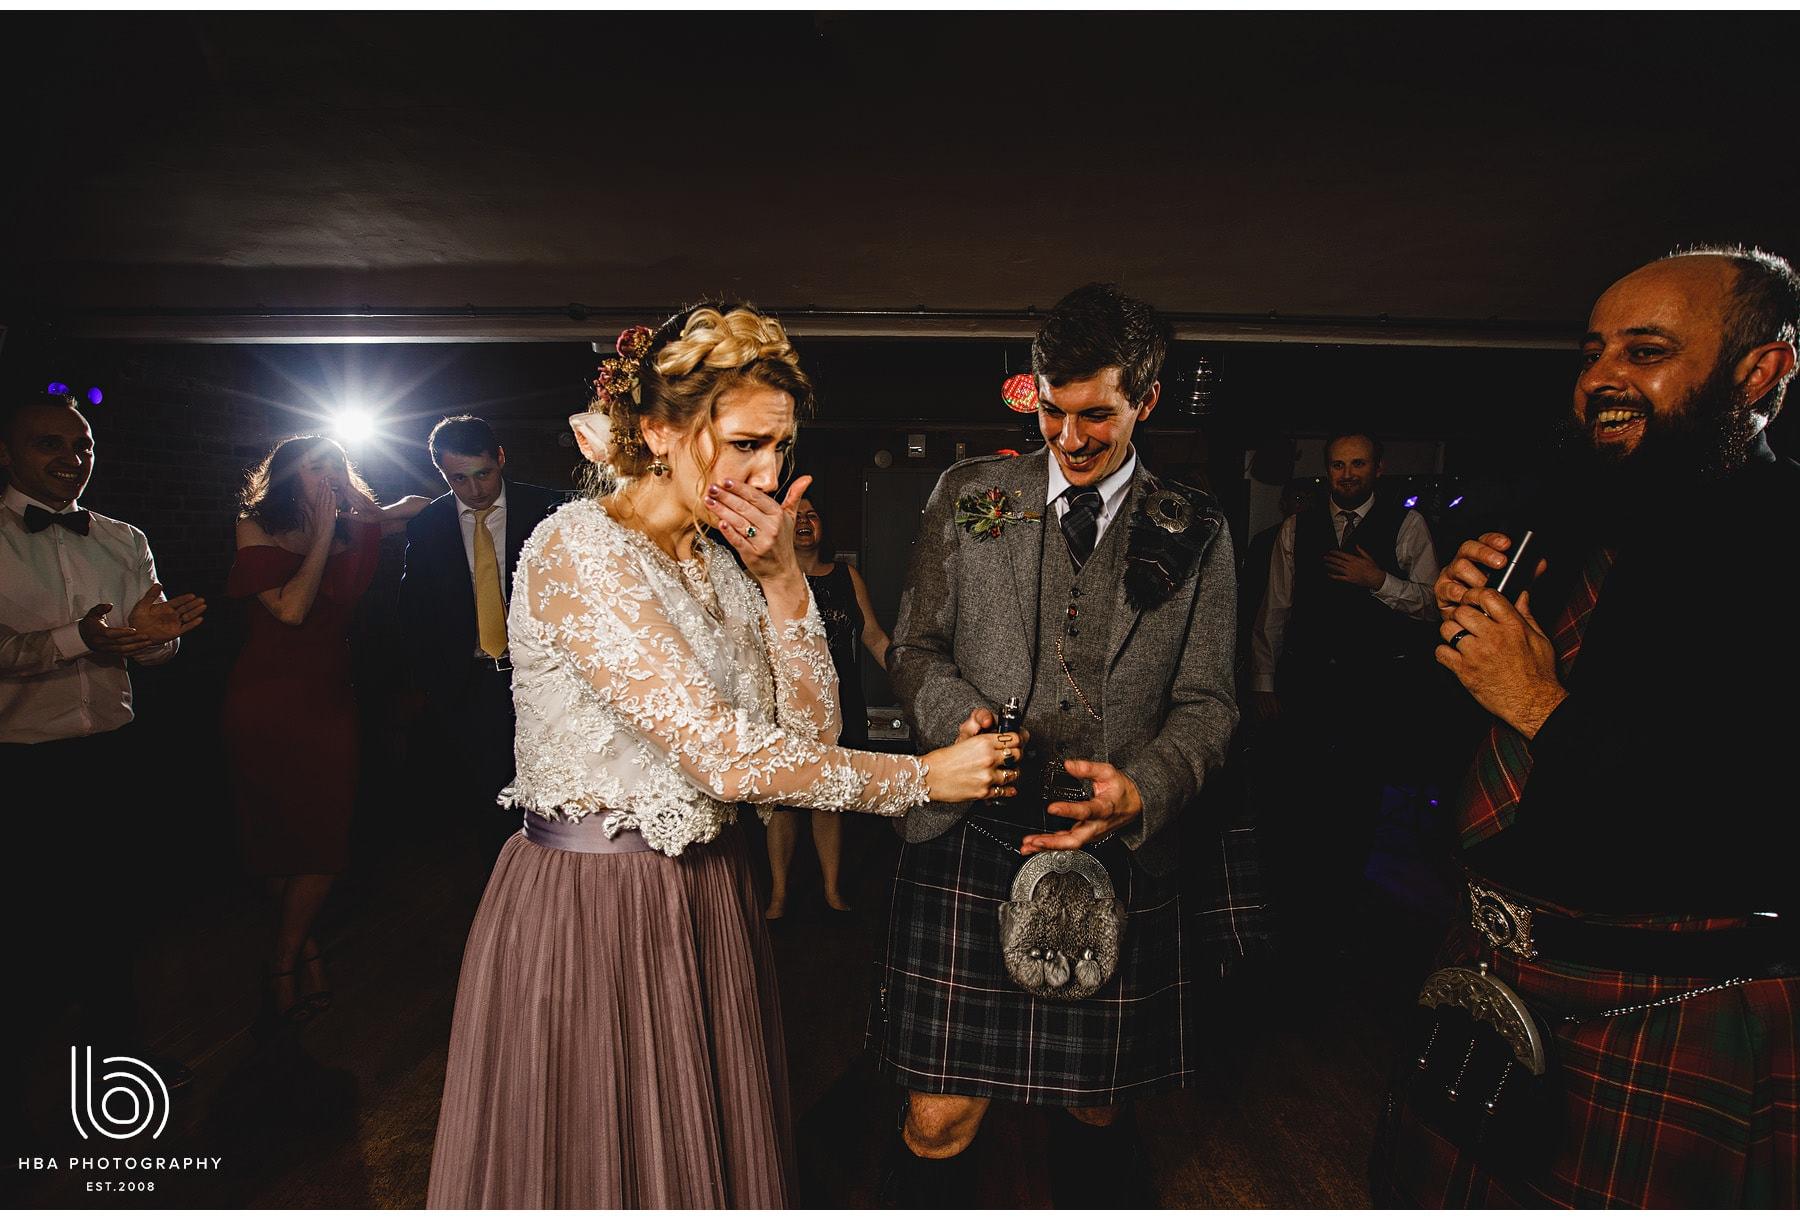 the bride having having a shot